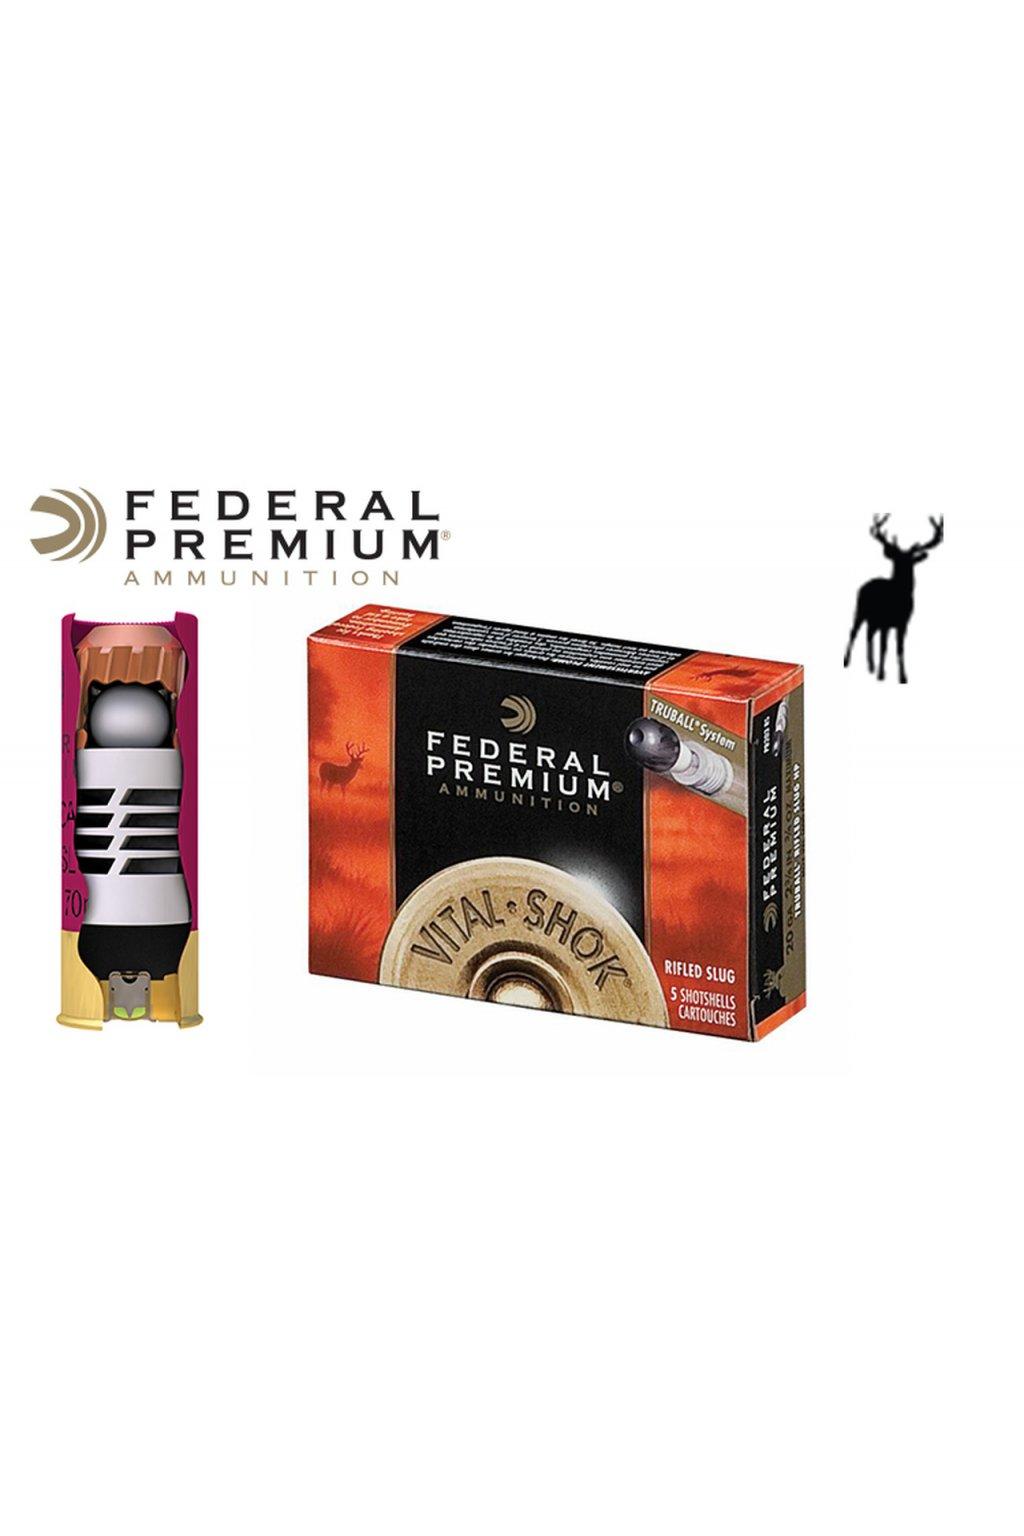 Federal Premium VitalShok TruBall Slugs Generic 54687.1540657319